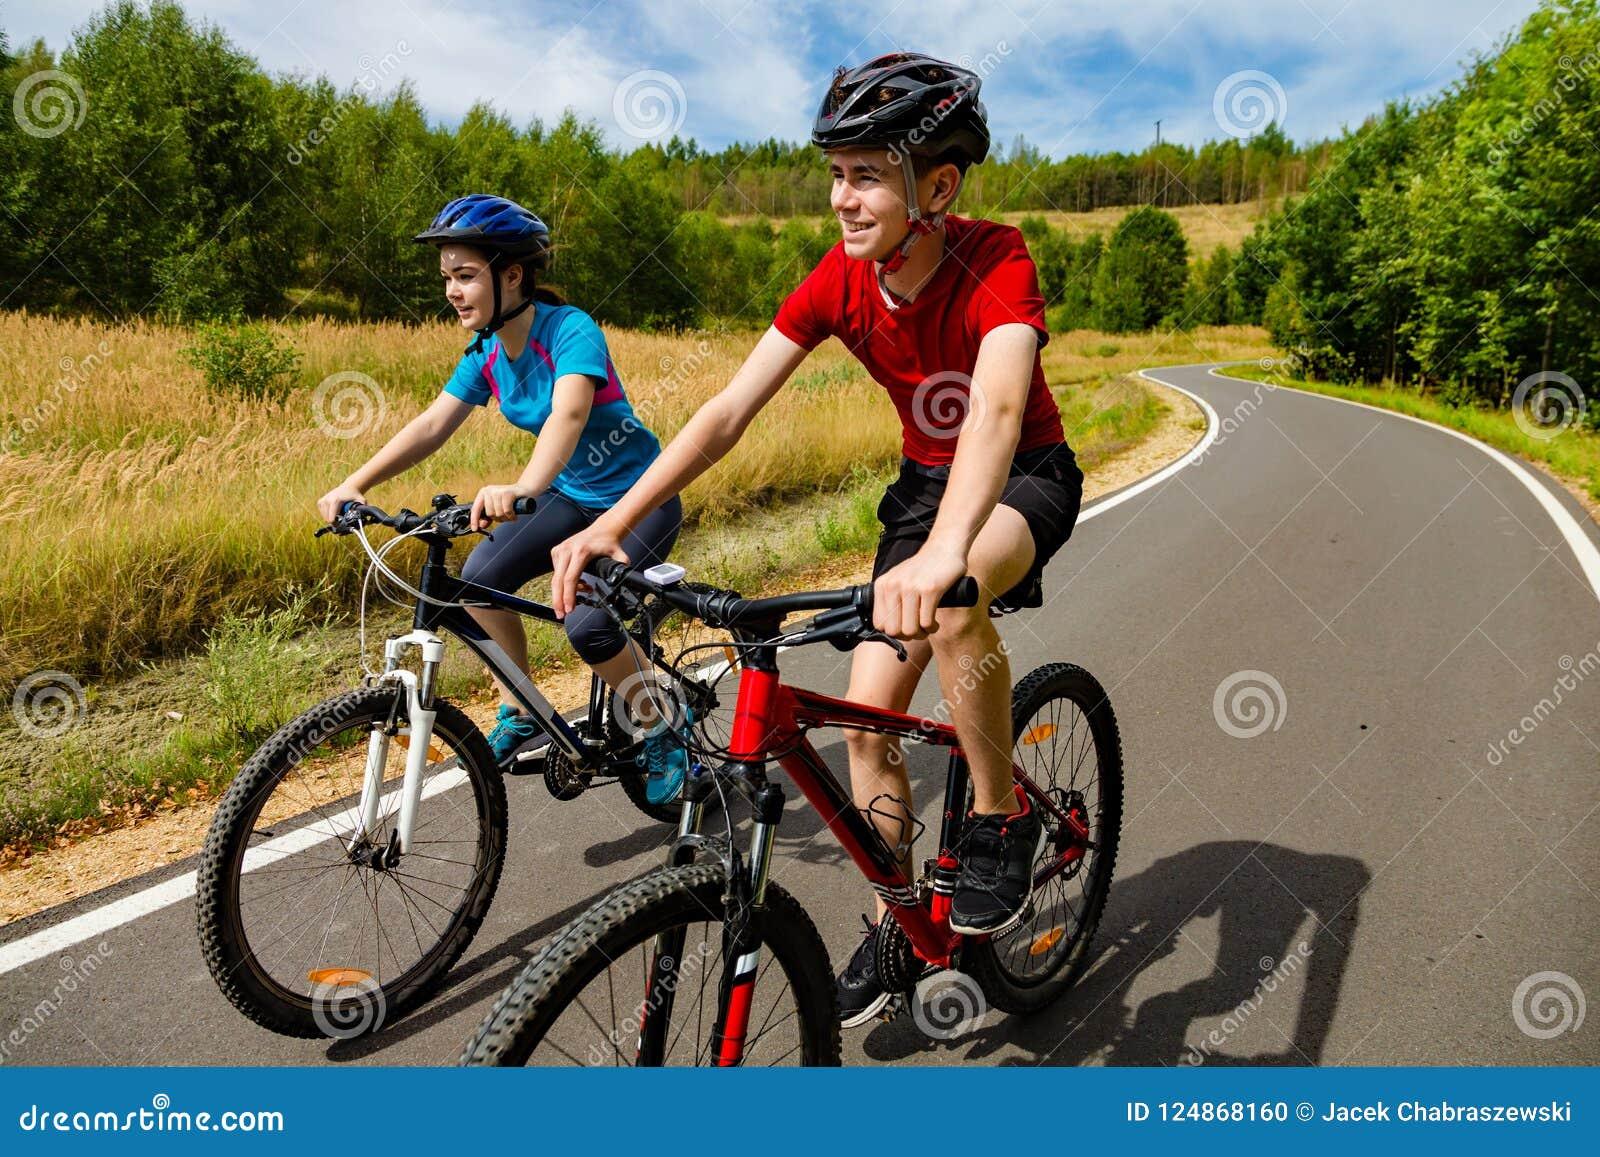 Teenage girl and boy cycling